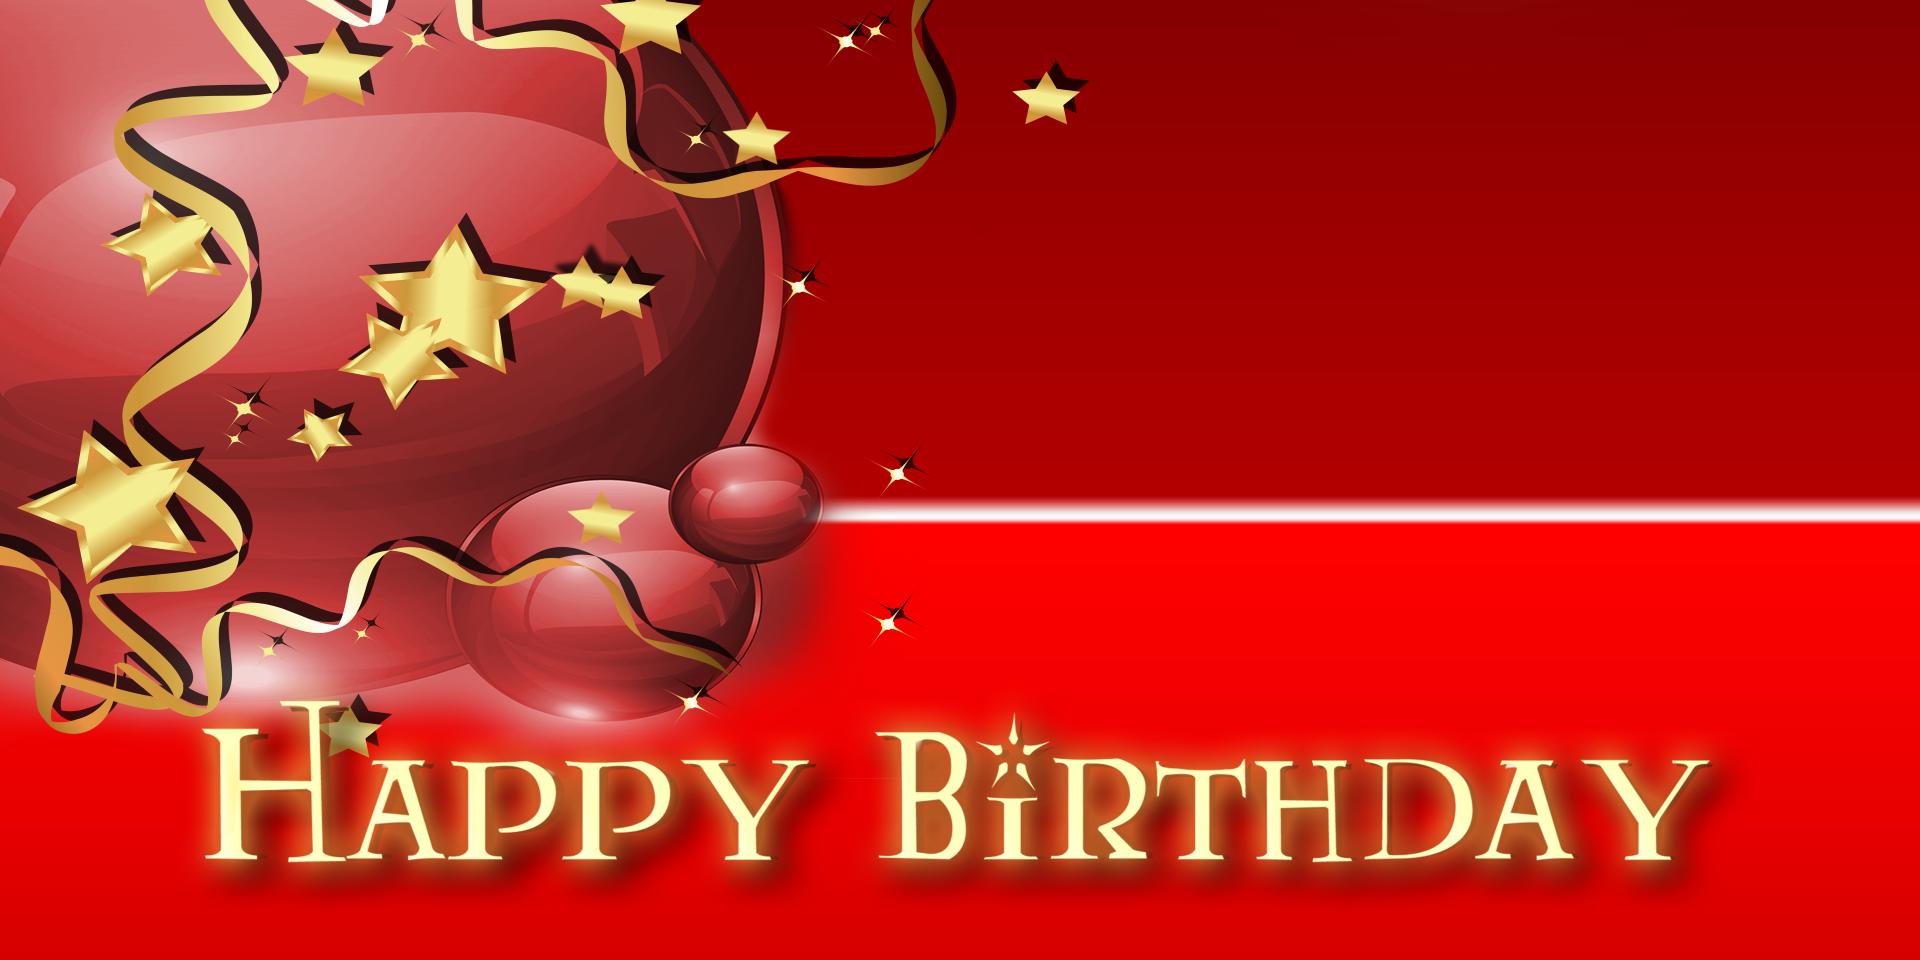 Happy Birthday Banner Star Balloon Red Vinyl Banners